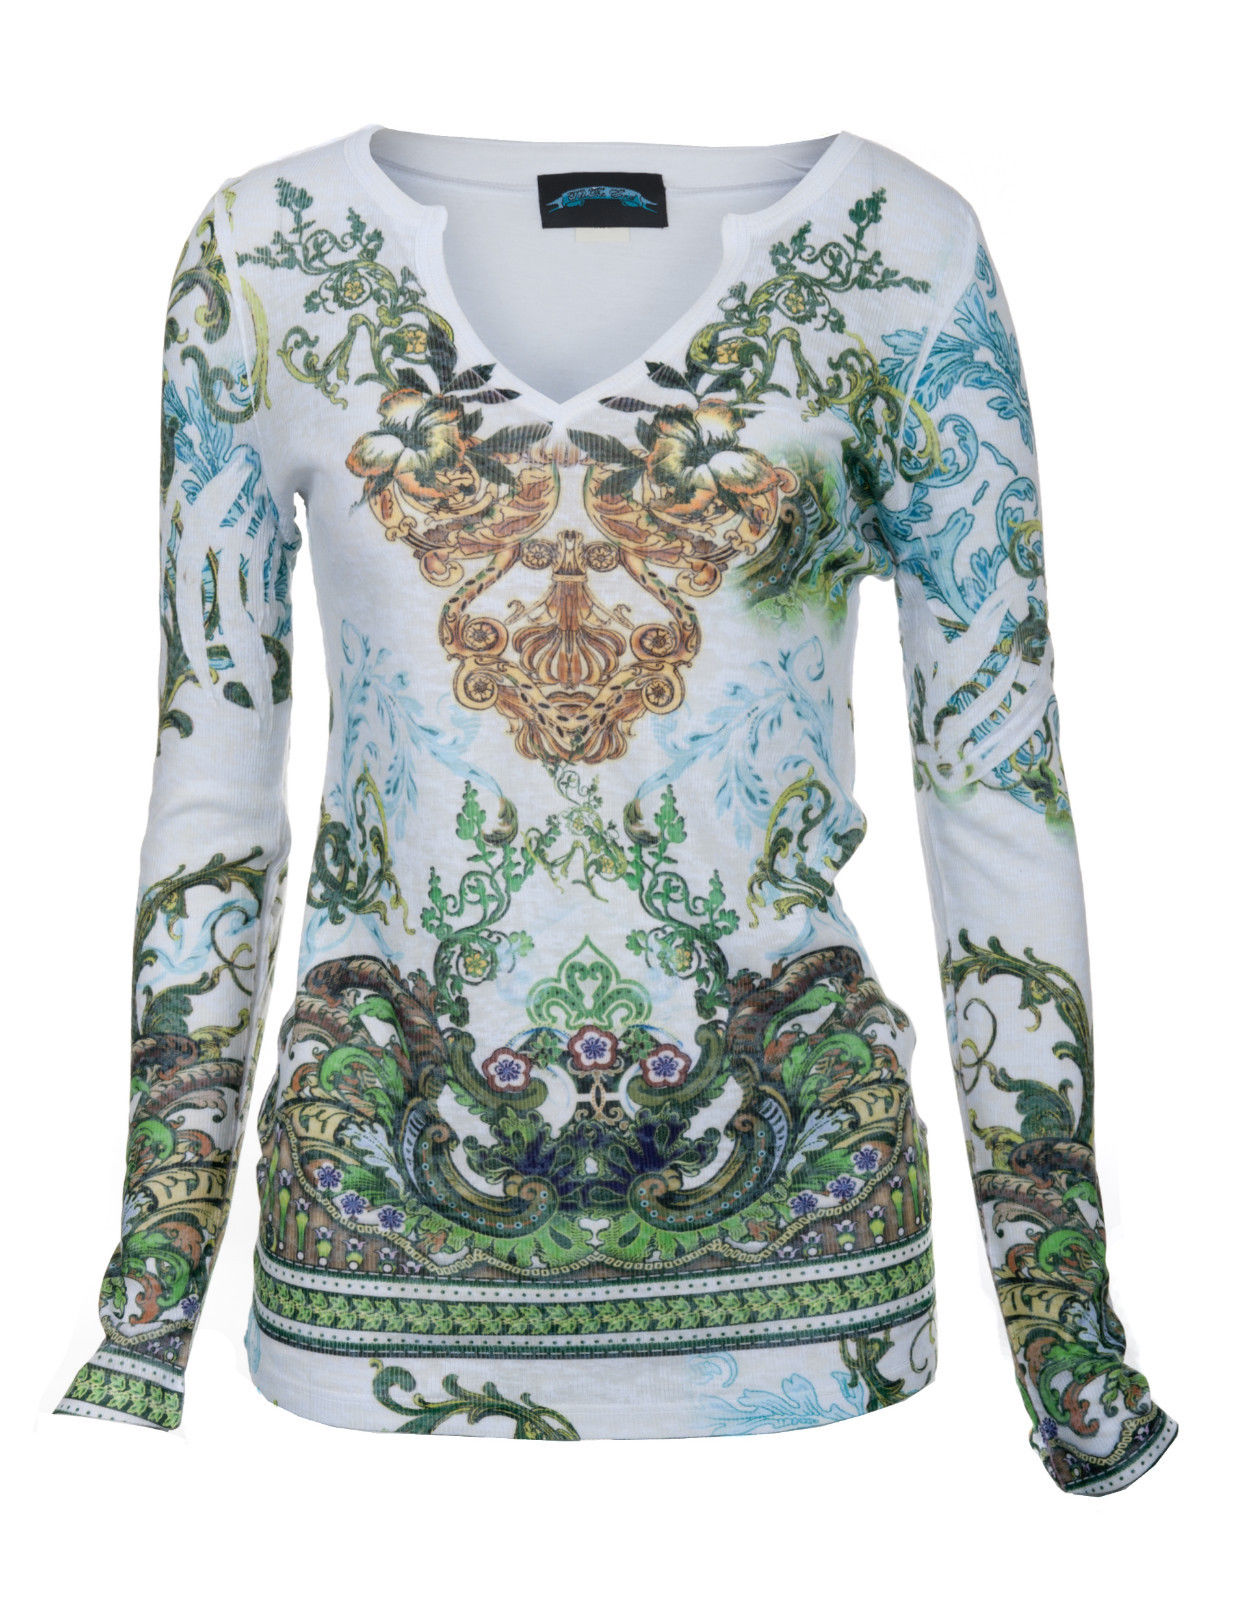 TTEVL04 Till the End Womens White Earth Print Long Sleeve 100% Cotton Blend Top